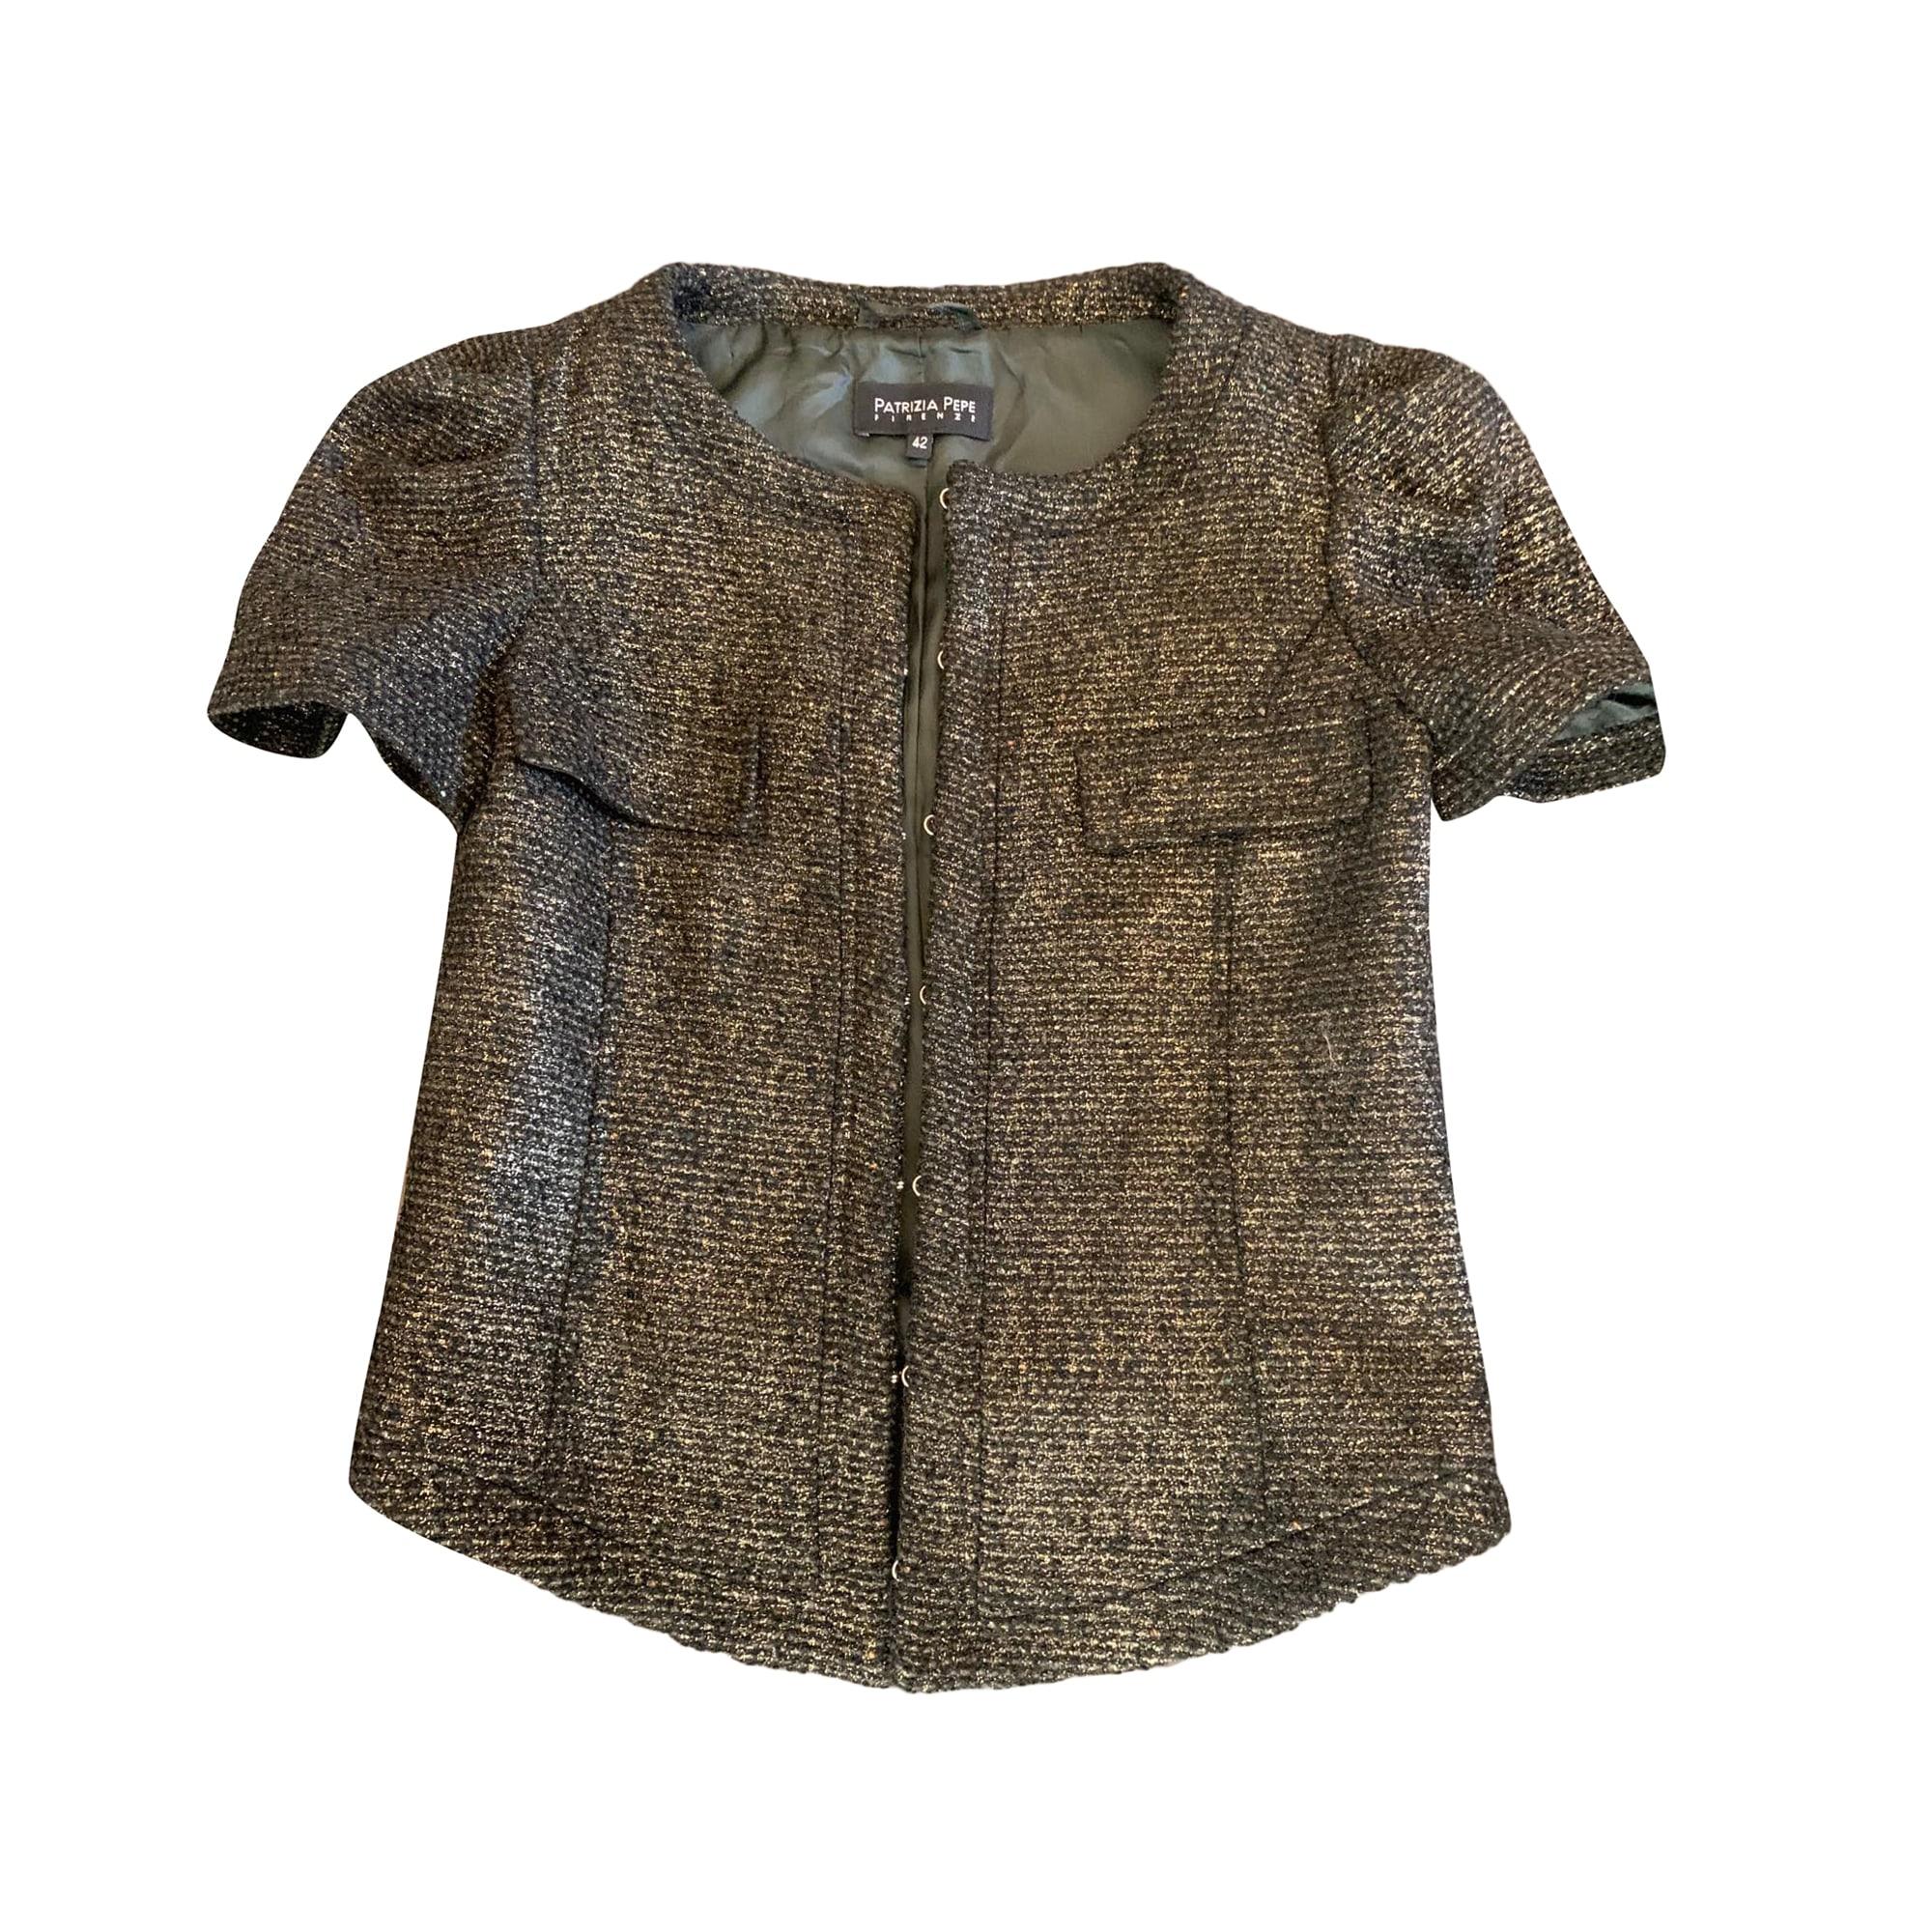 Blazer, veste tailleur PATRIZIA PEPE Doré, bronze, cuivre